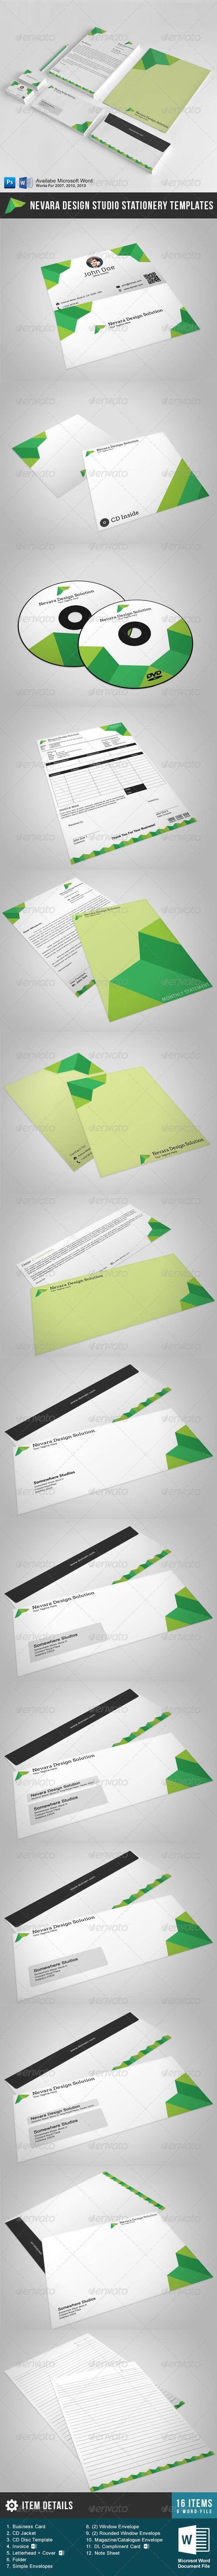 GraphicRiver Nevara Design Studios Stationery 5445818